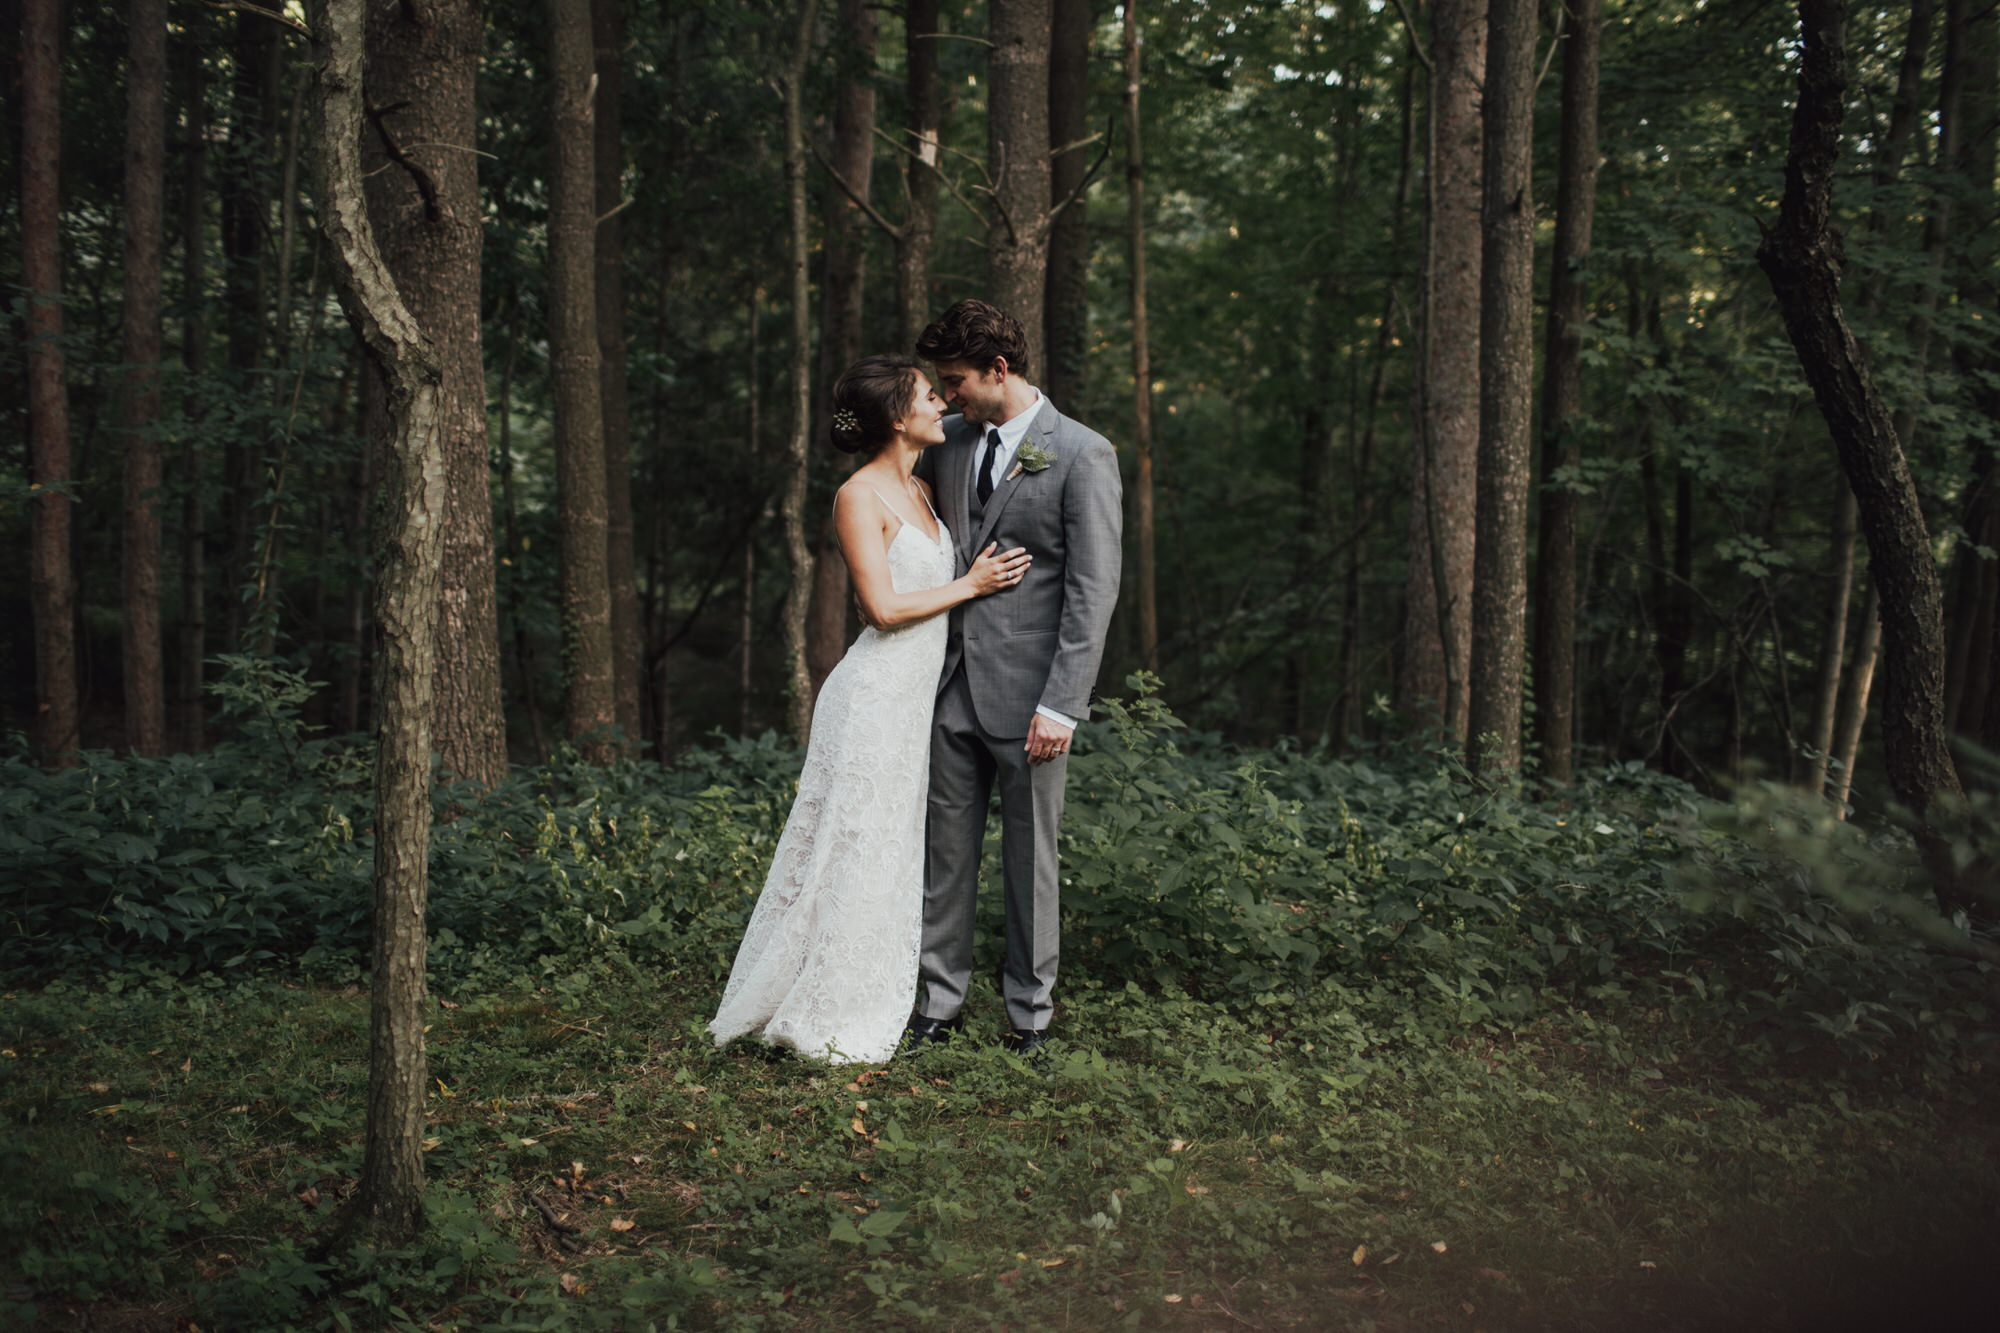 emily-aaron-rochester-new-york-wedding-photographer-106.JPG